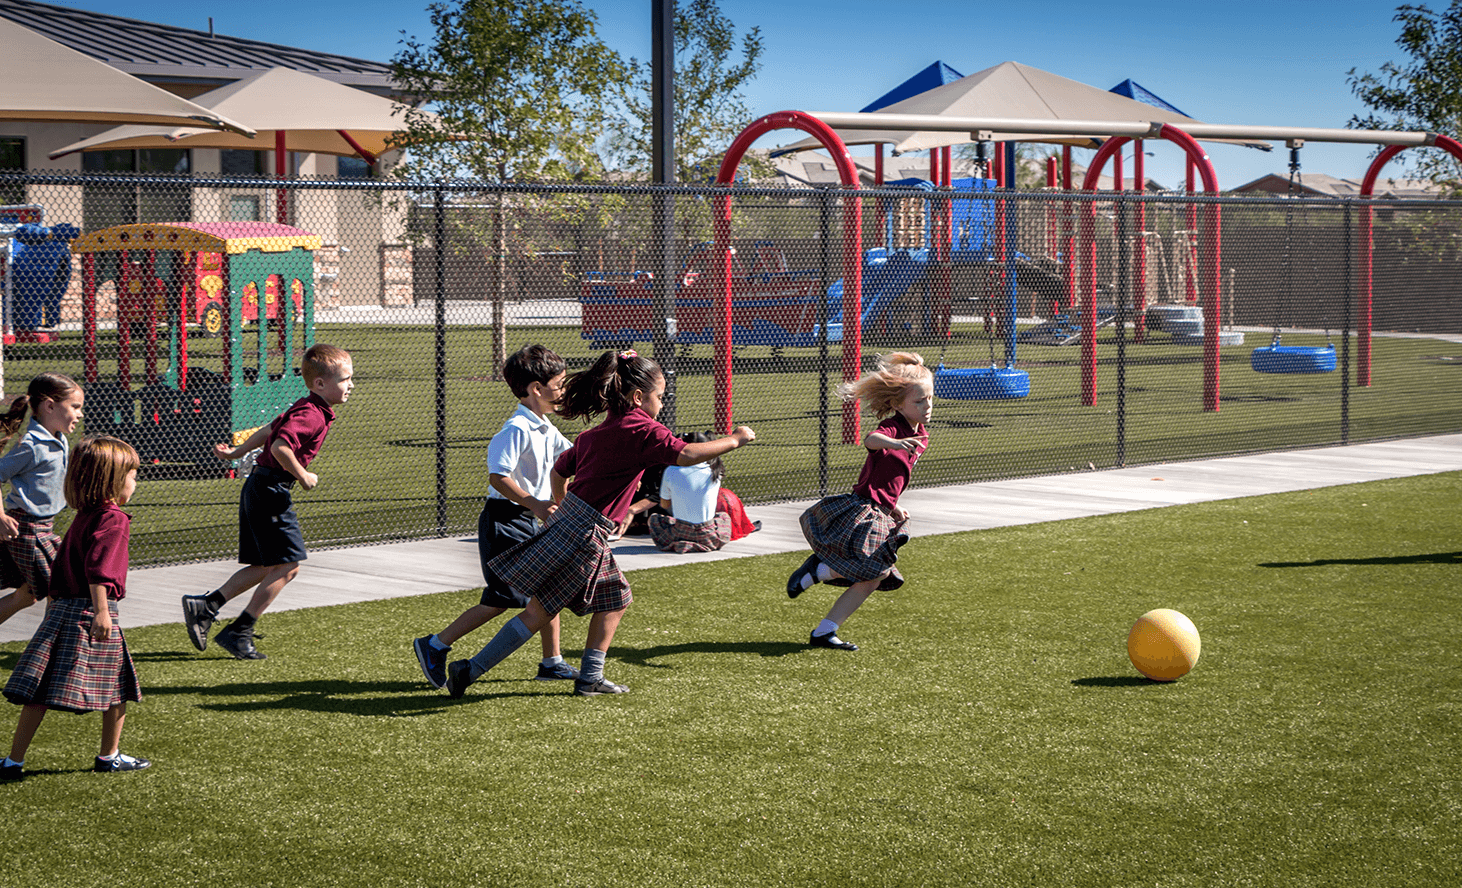 Playground Ball | Challenger School - Desert Hills | Private School In Las Vegas, Nevada